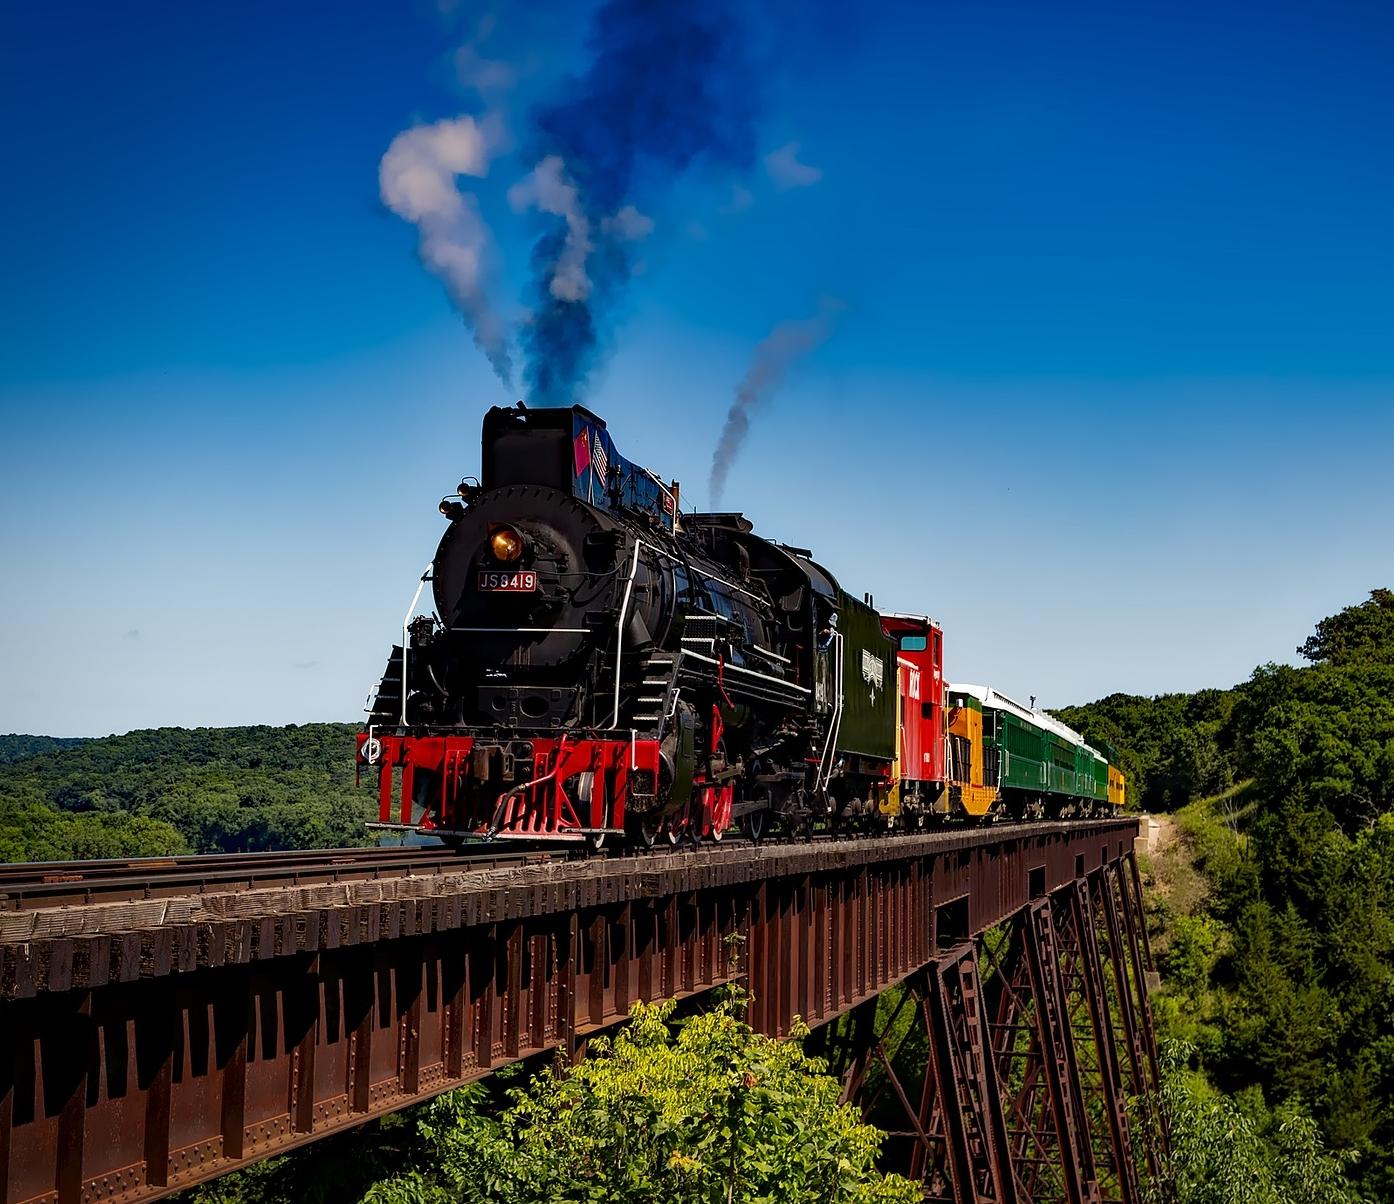 train-1728537_1920.jpg